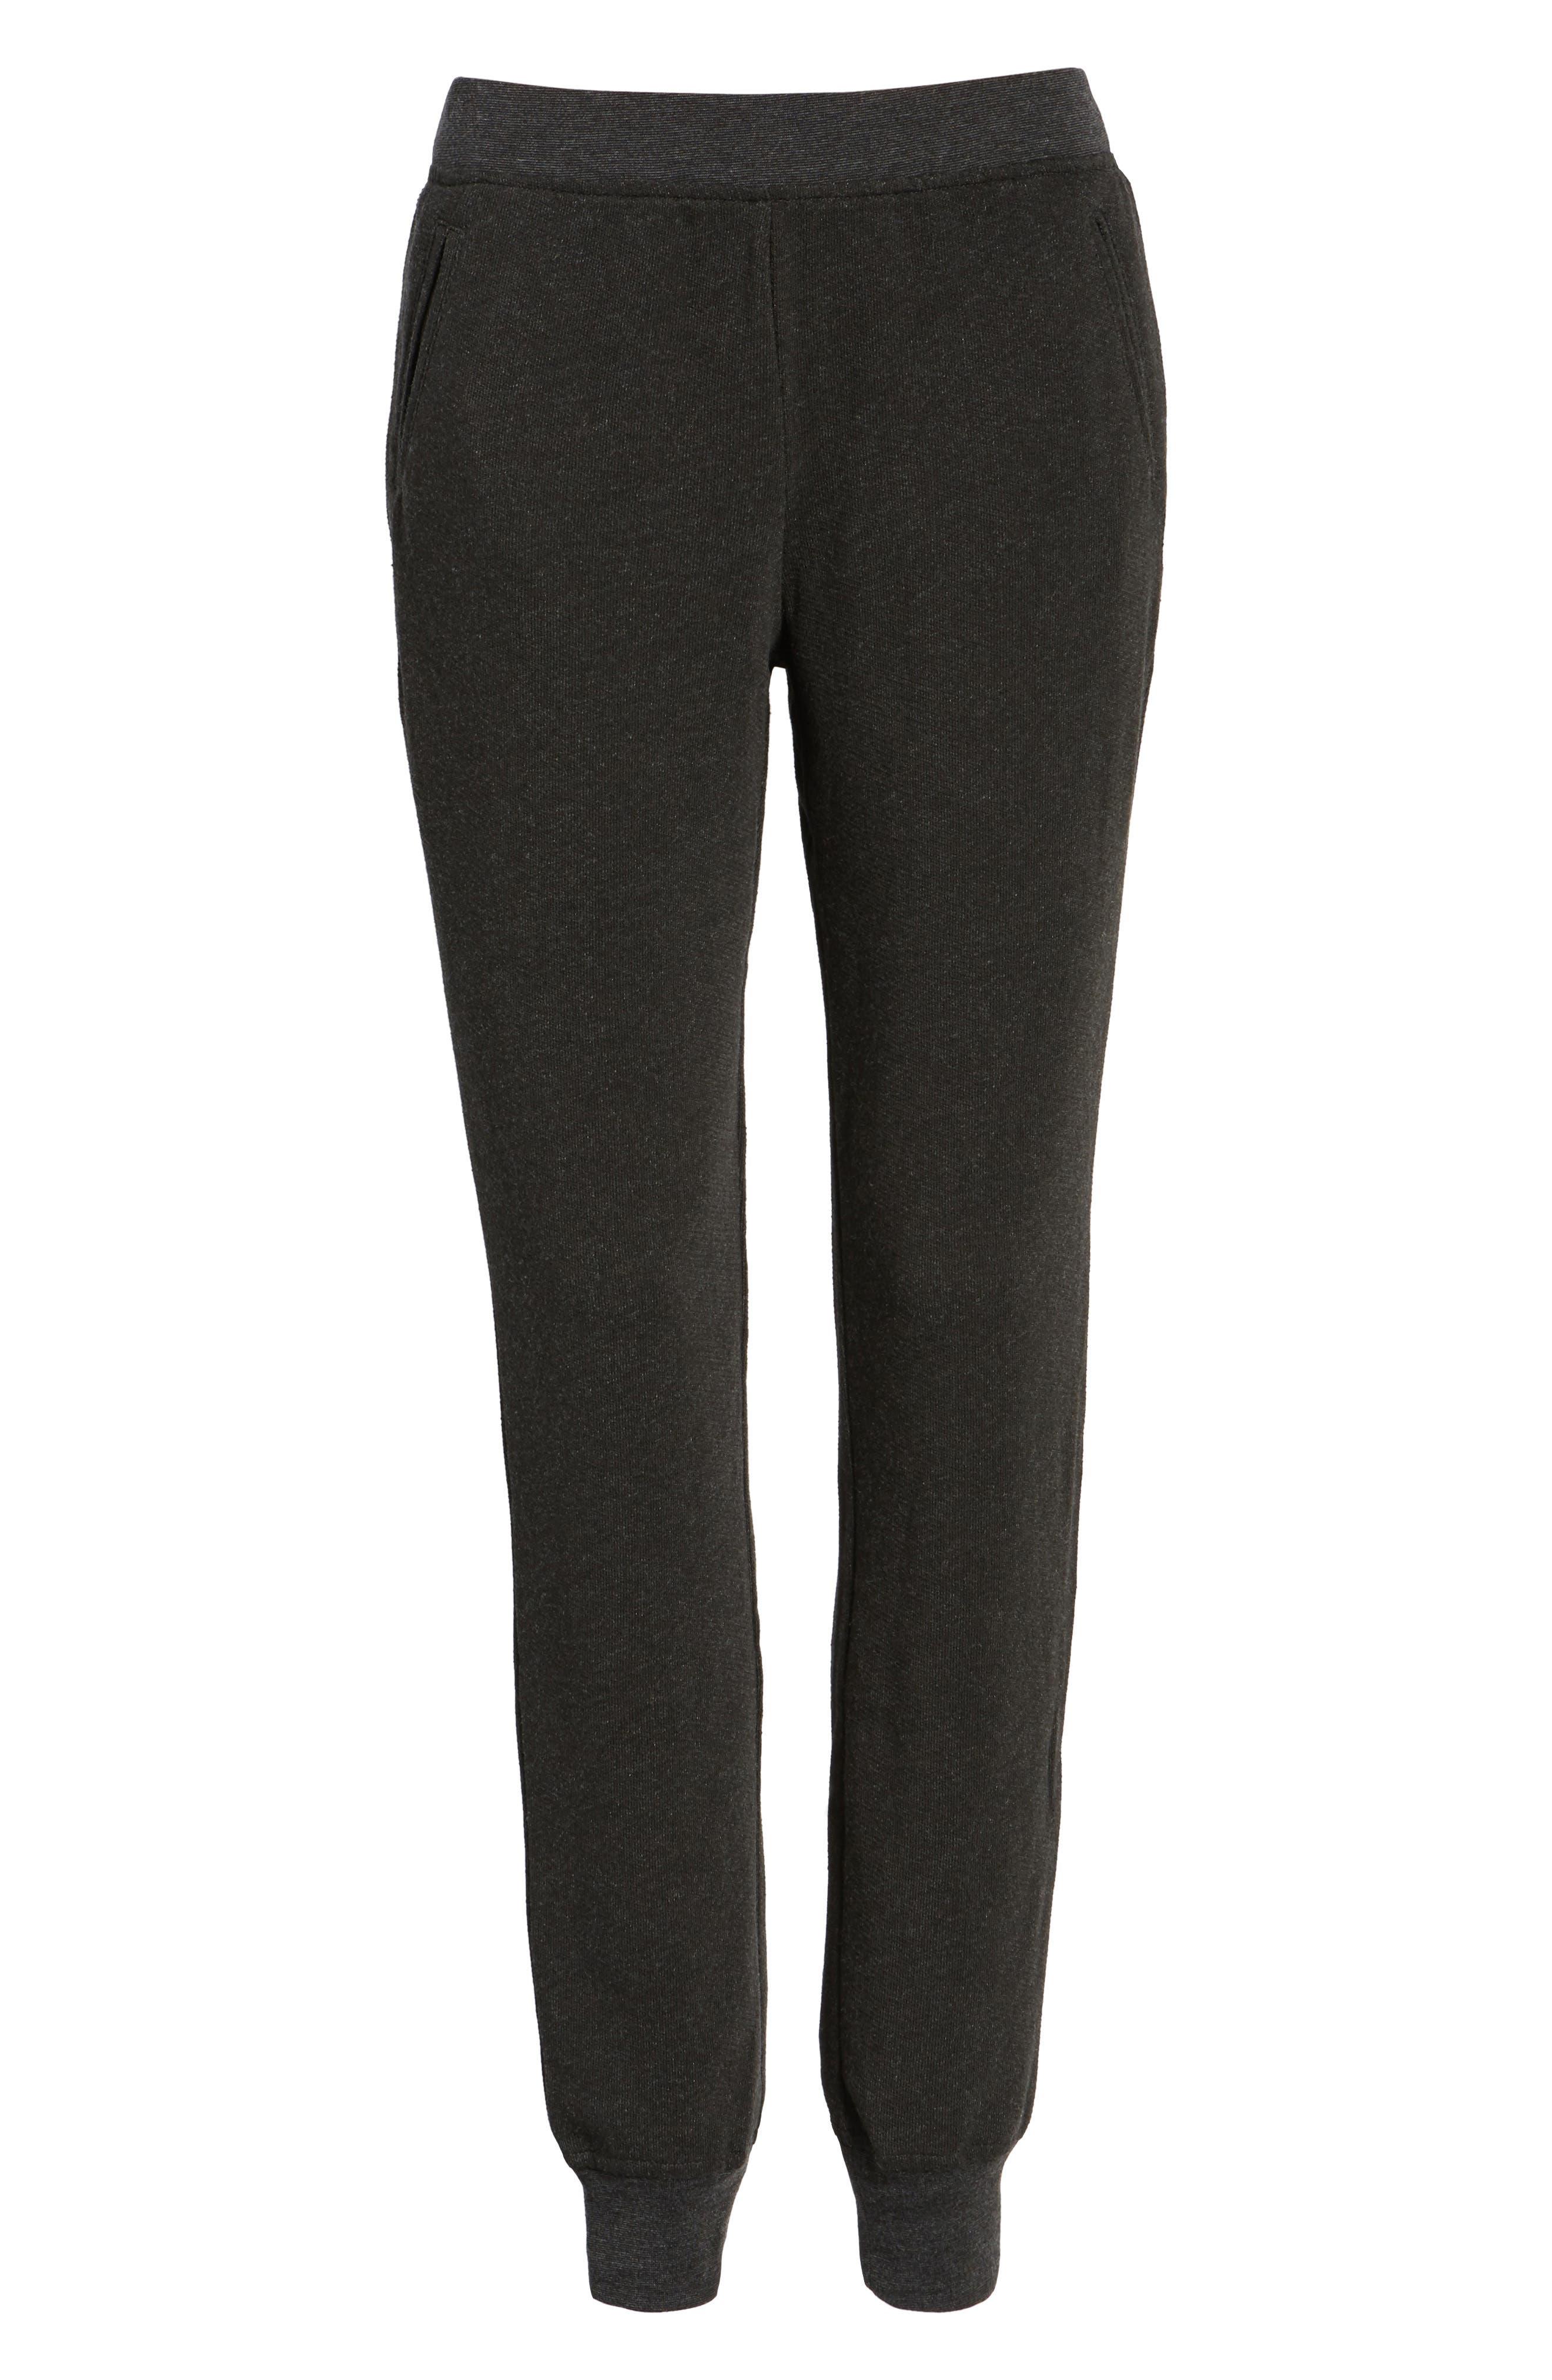 Slim Sweatpants,                         Main,                         color, CHARCOAL HEATHER